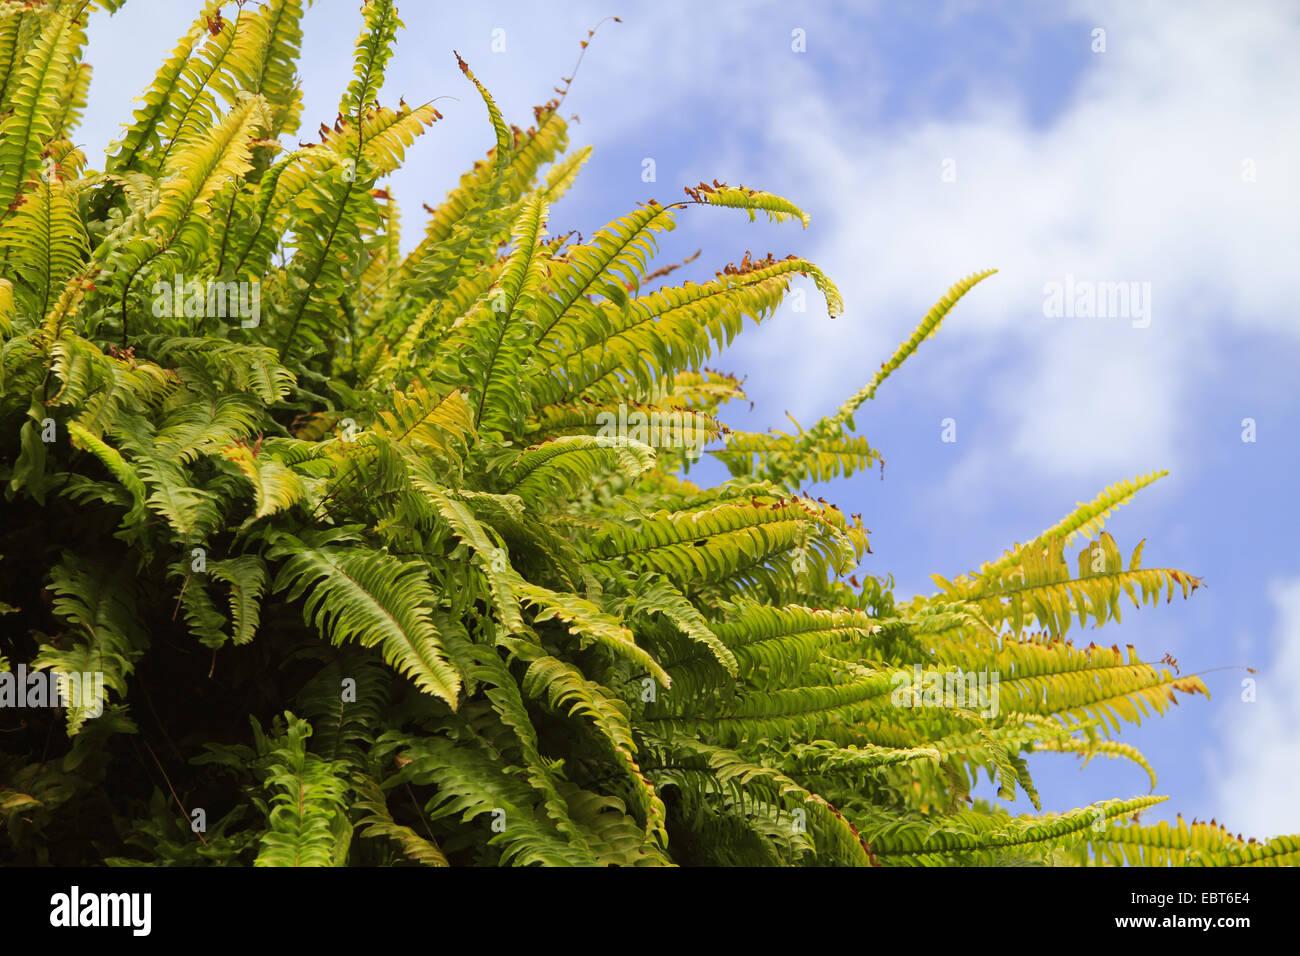 Helecho de Boston (Nephrolepis exaltata), planta en frente del cielo azul Imagen De Stock